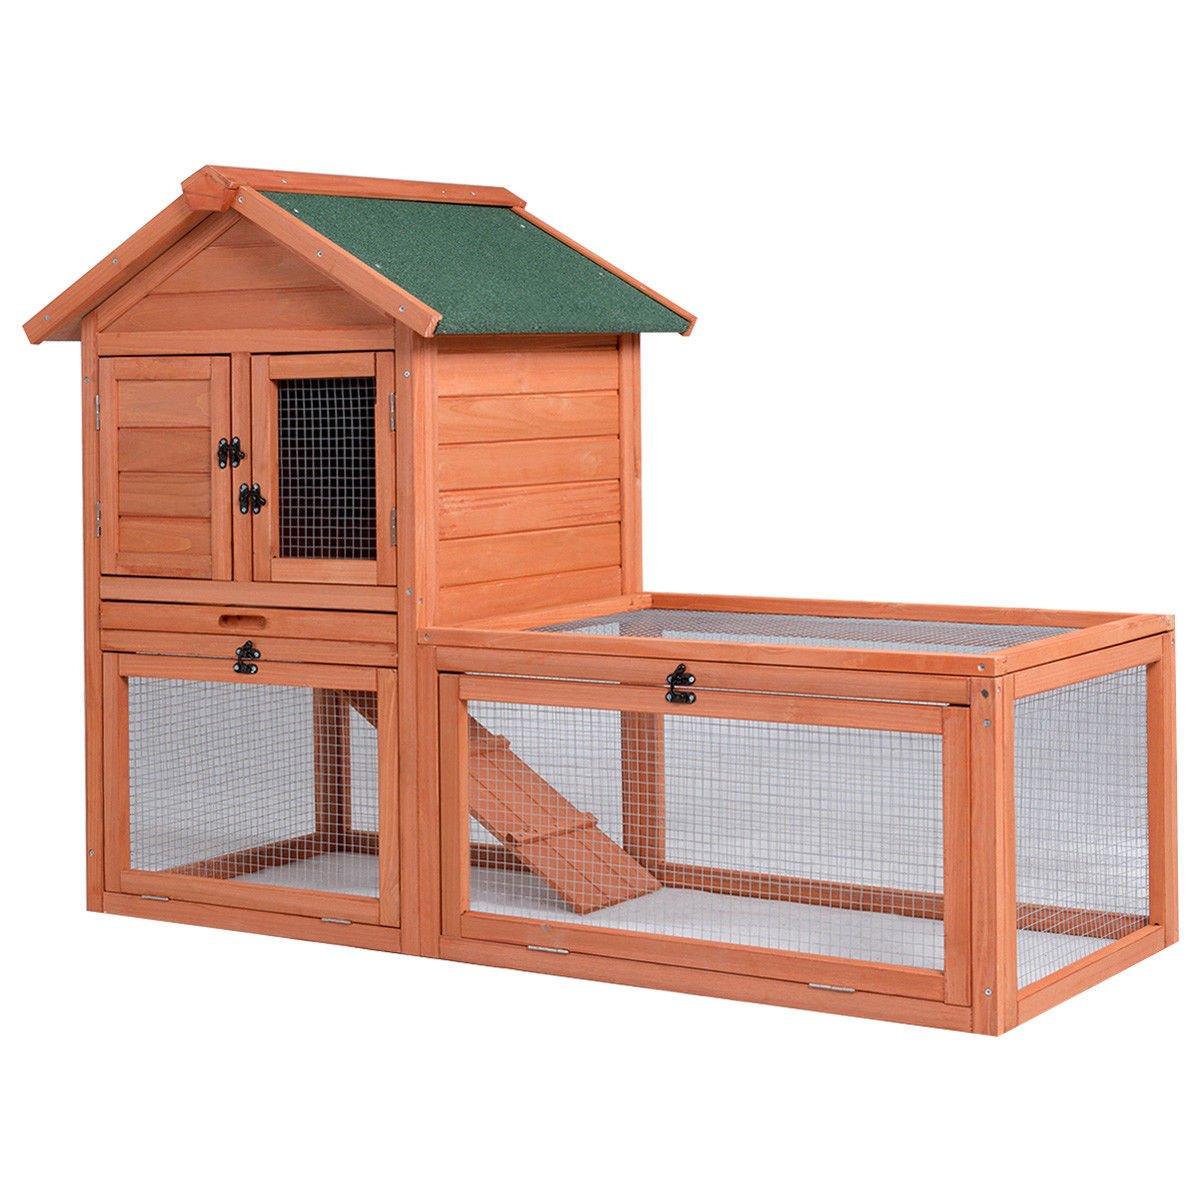 Tangkula Chicken Coop Wooden Garden Backyard Bunny Small Animal Hen Cage Rabbit Hutch with Run